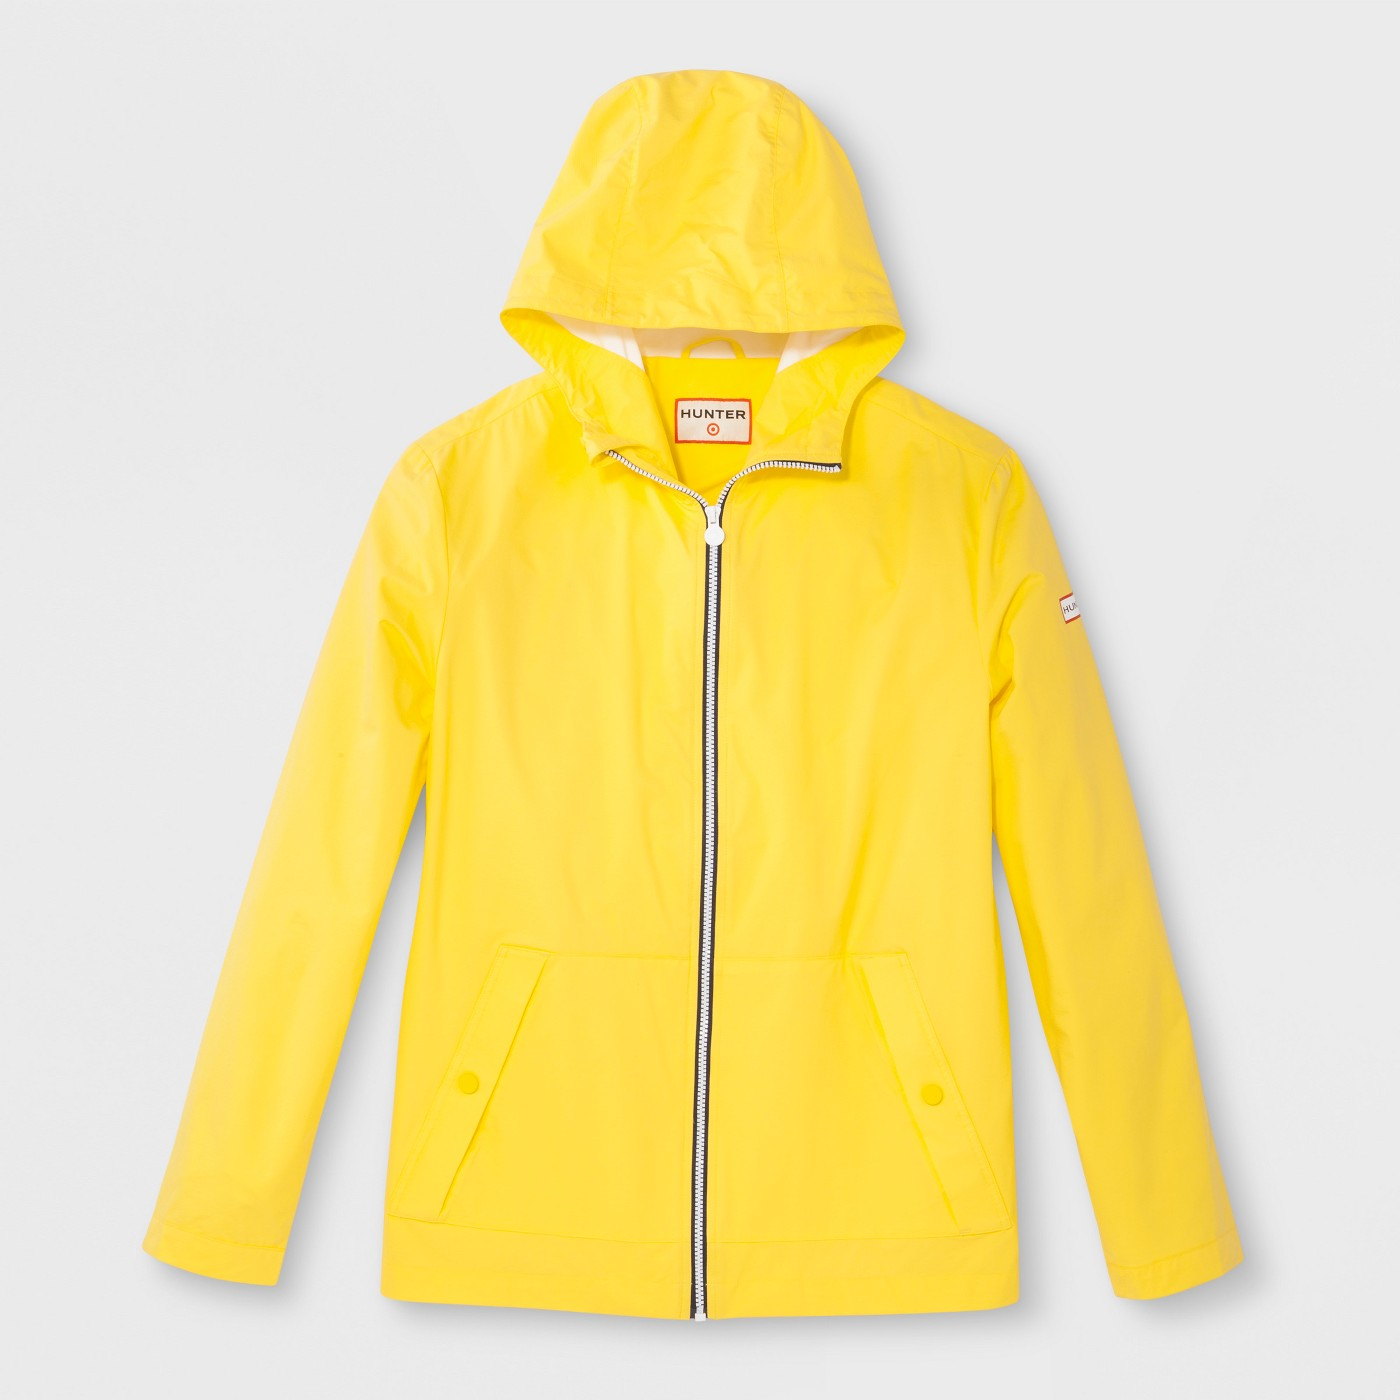 Hunter for Target raincoat